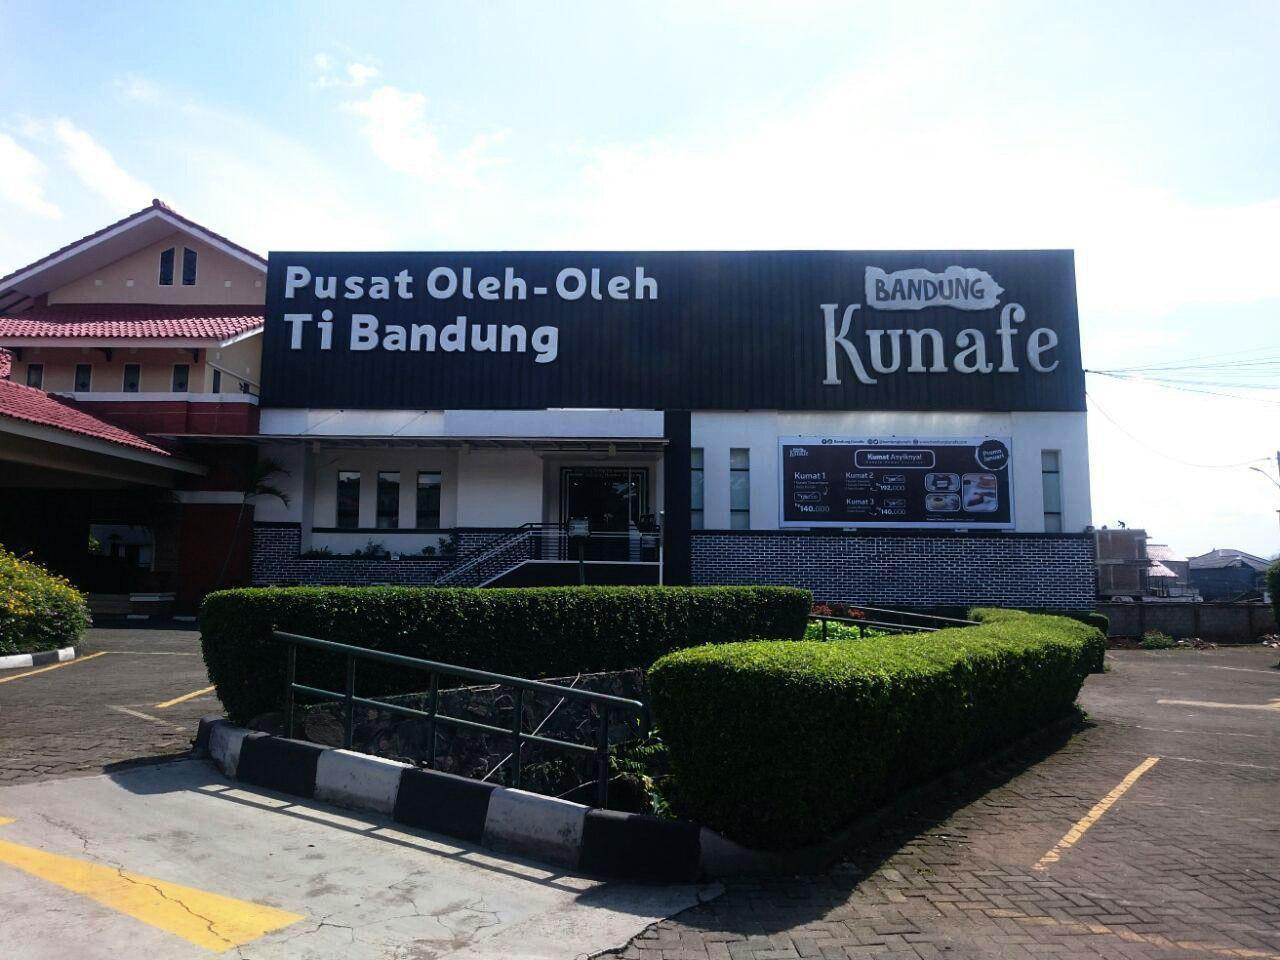 Liburan hemat di Bandung